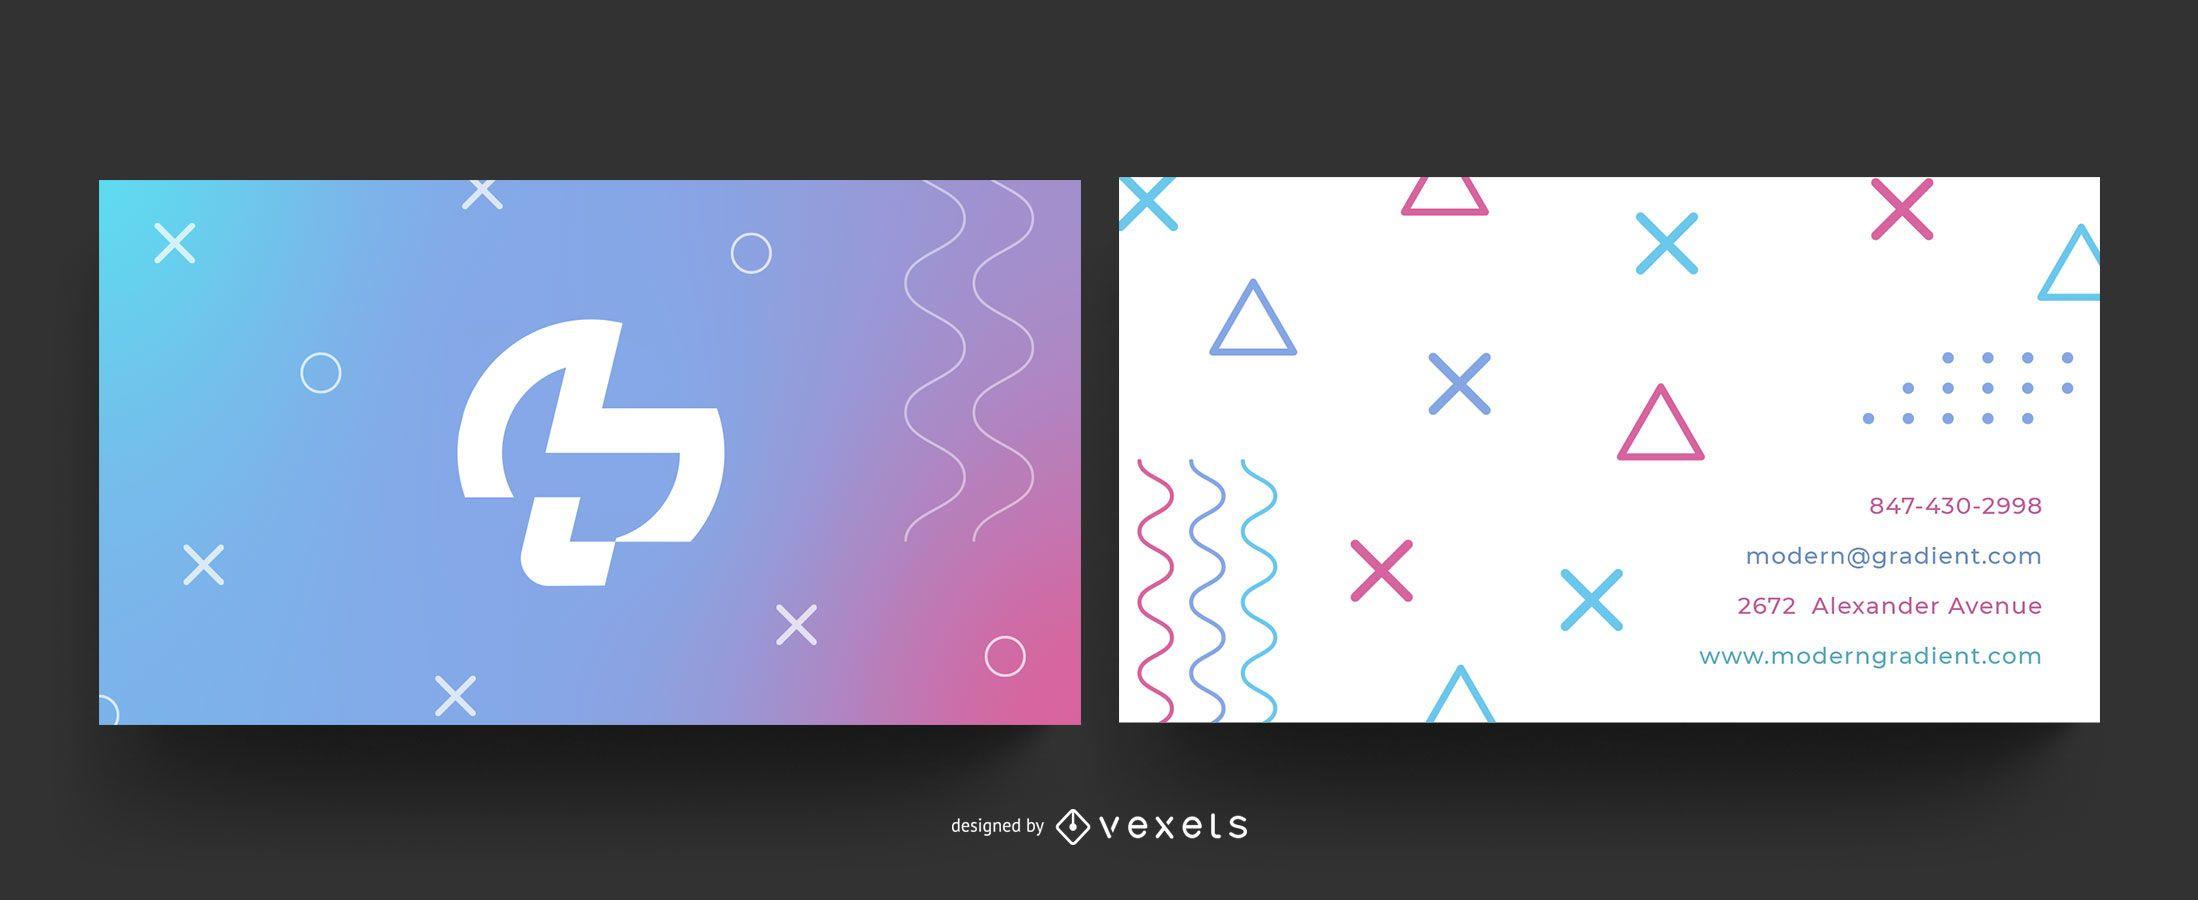 Geometric gradient business card